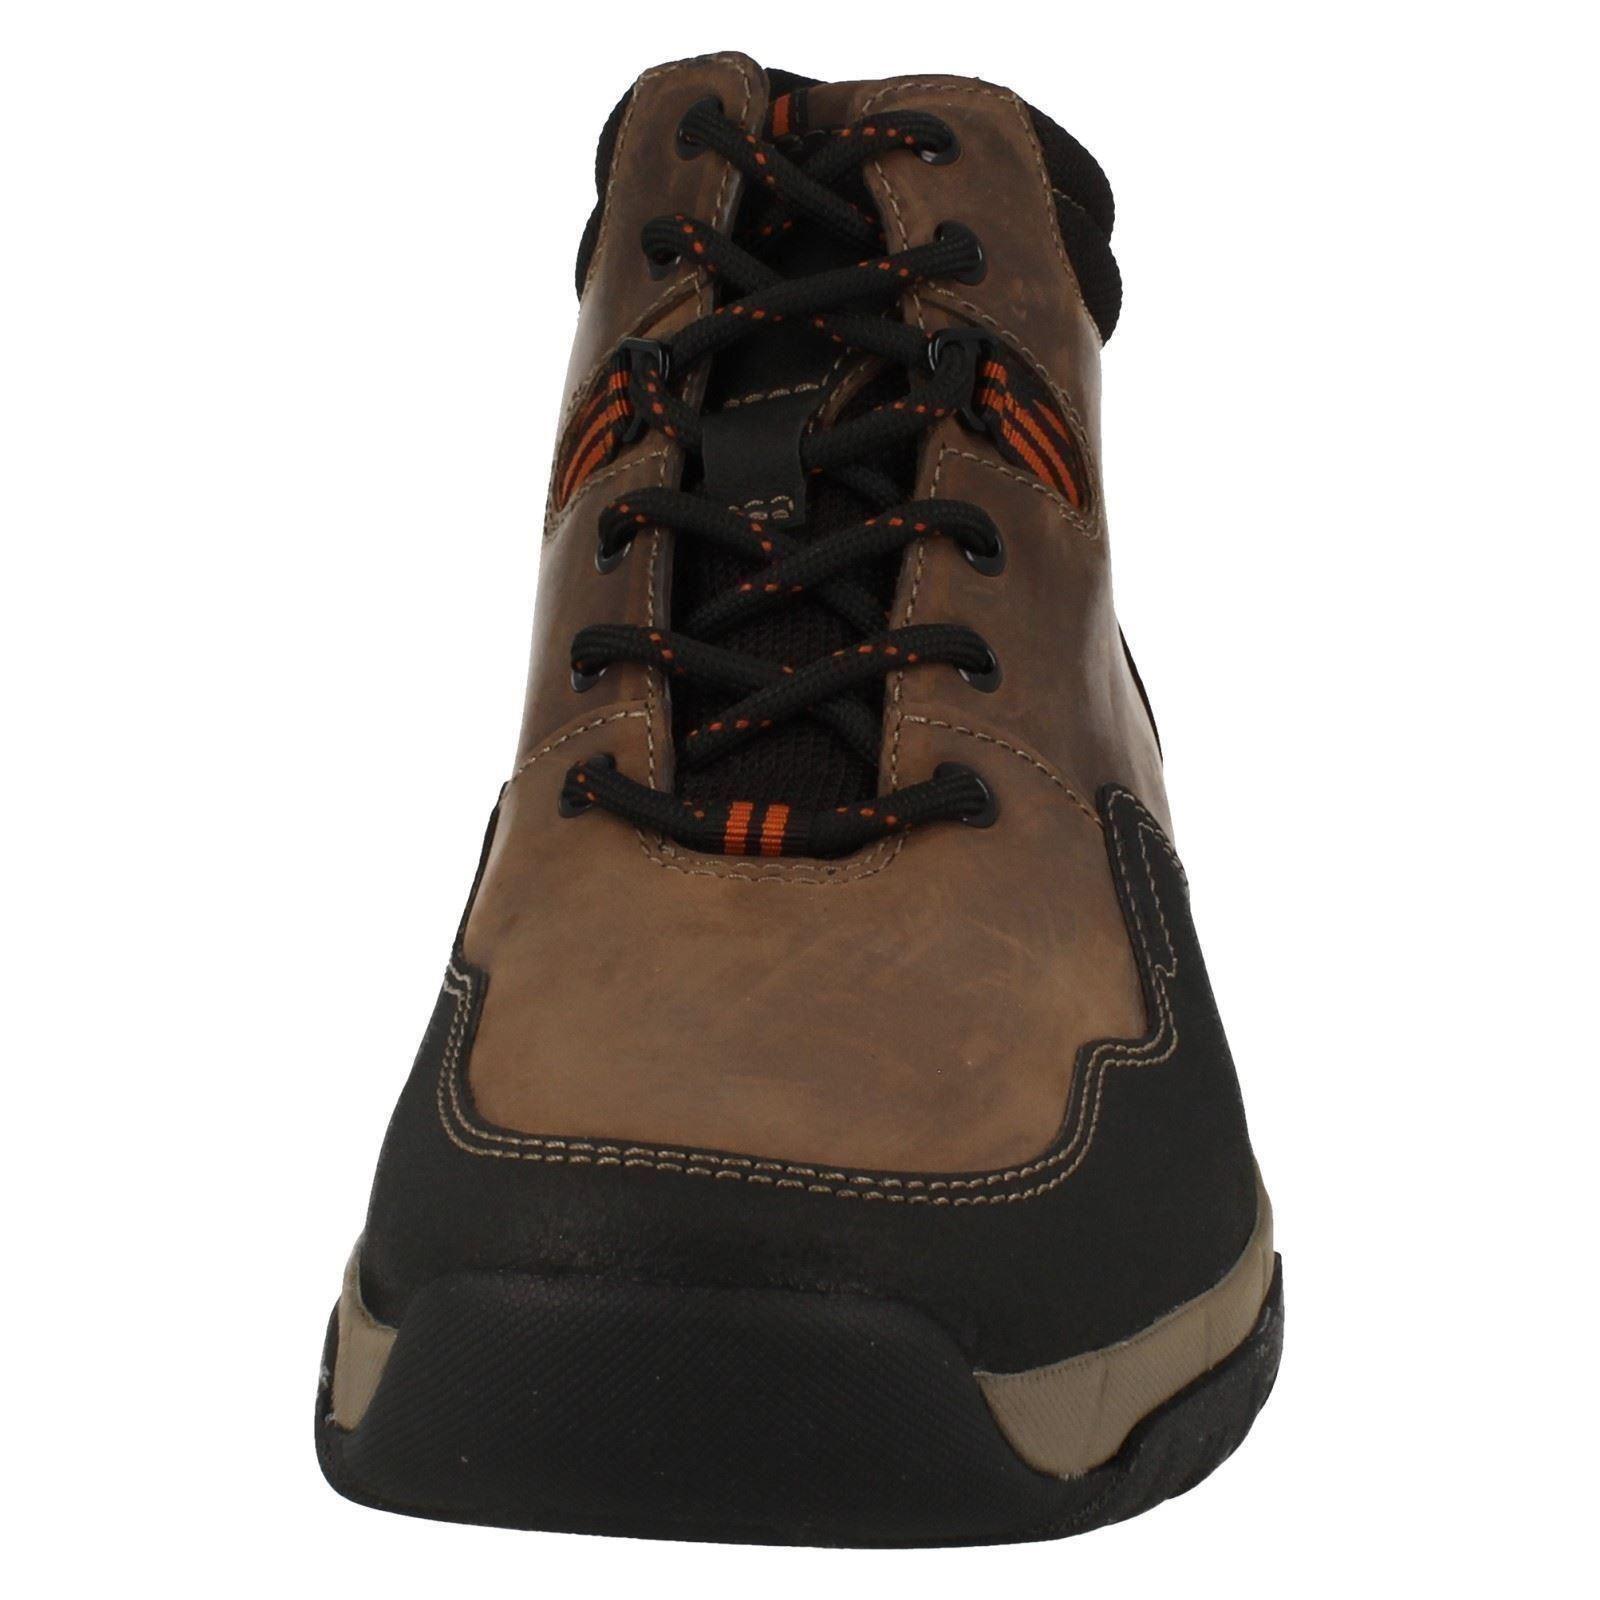 Uomo Clarks Waterproof Walbeck Lace Up Stiefel Walbeck Waterproof Top 826f16